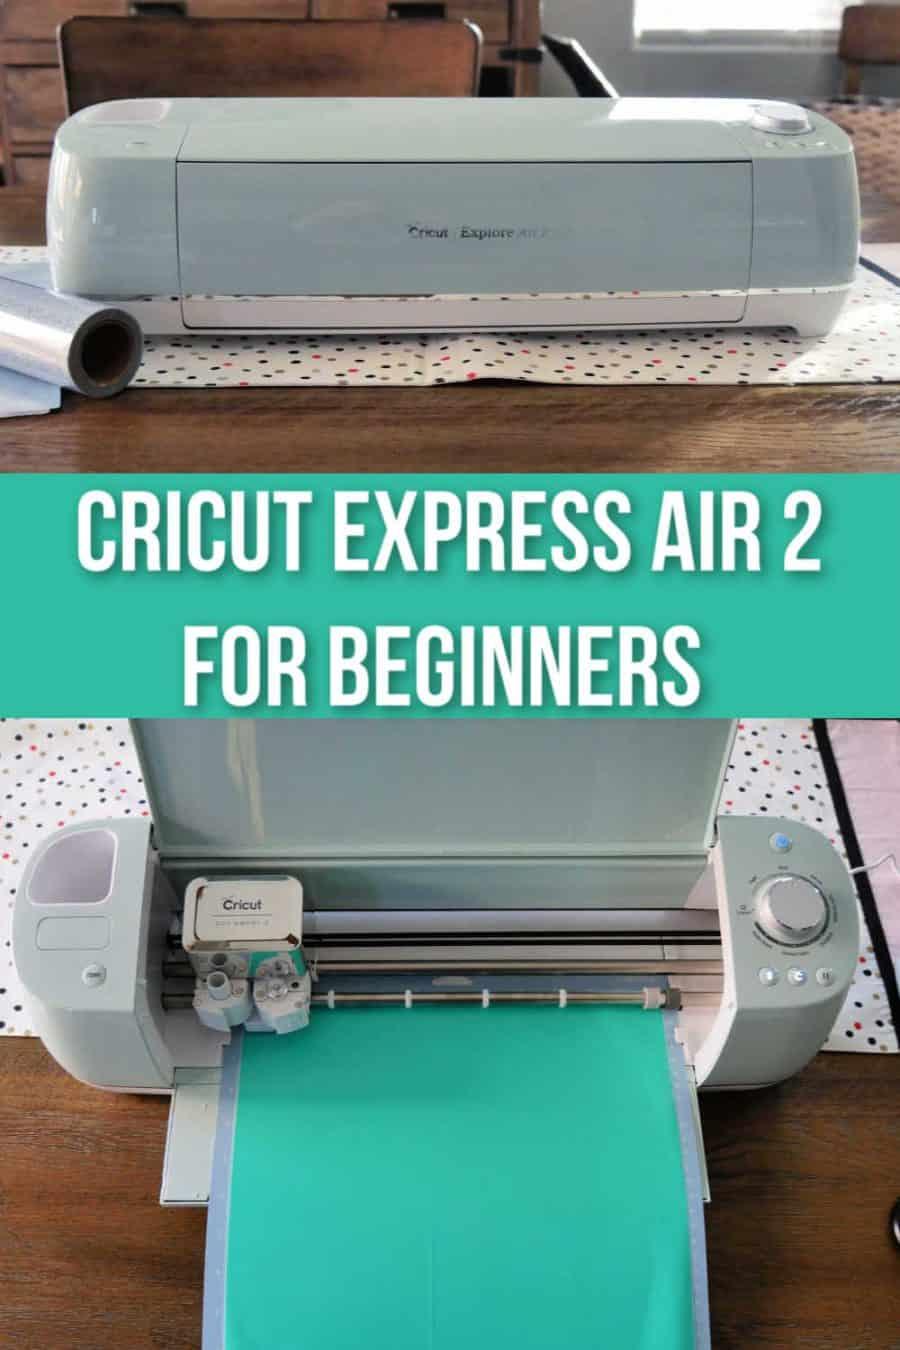 Cricut Explore Air 2 machine